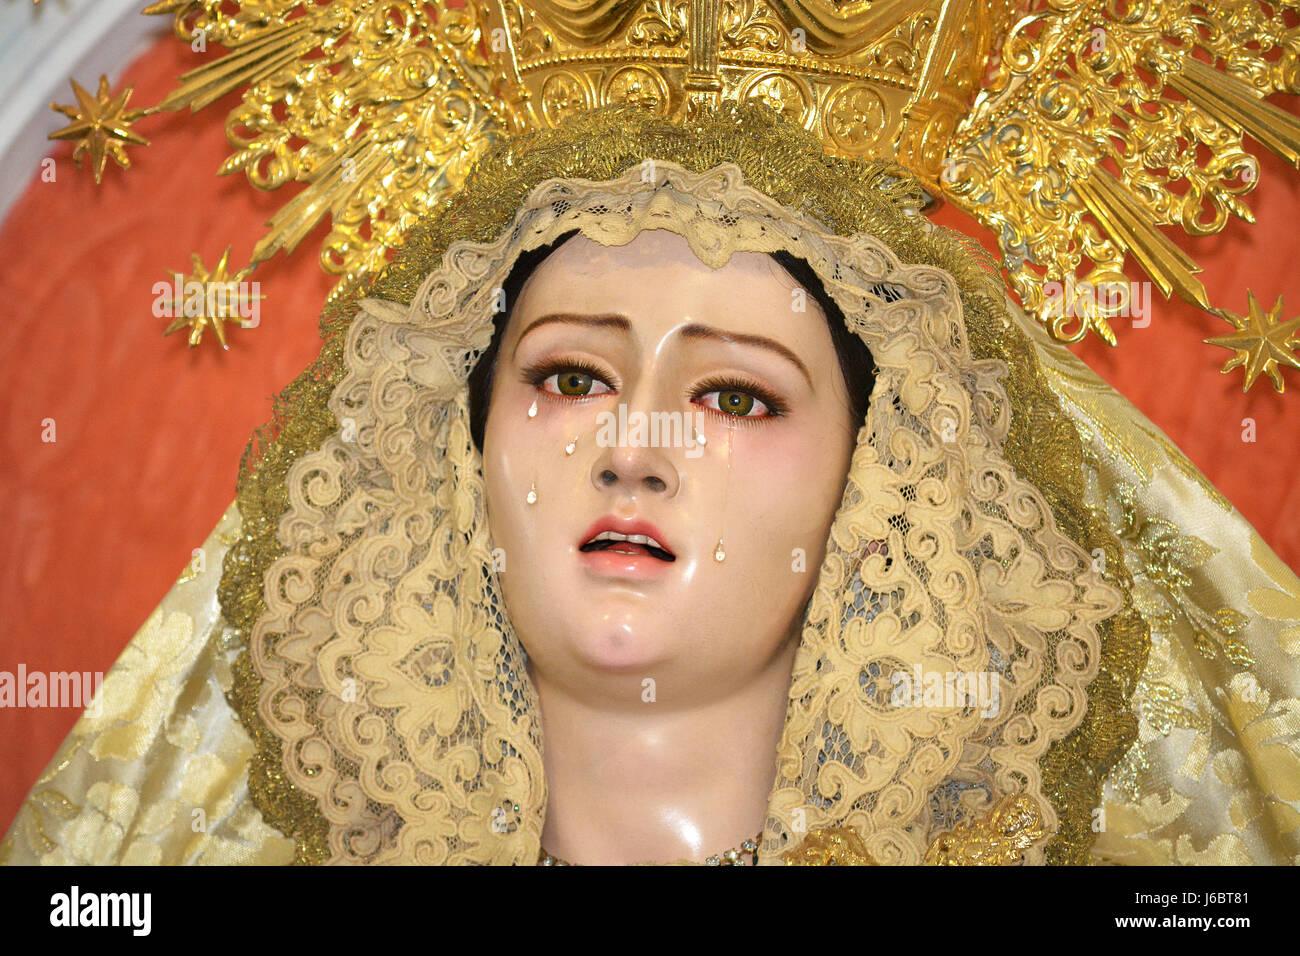 A Spanish Mater Dolorosa - Stock Image